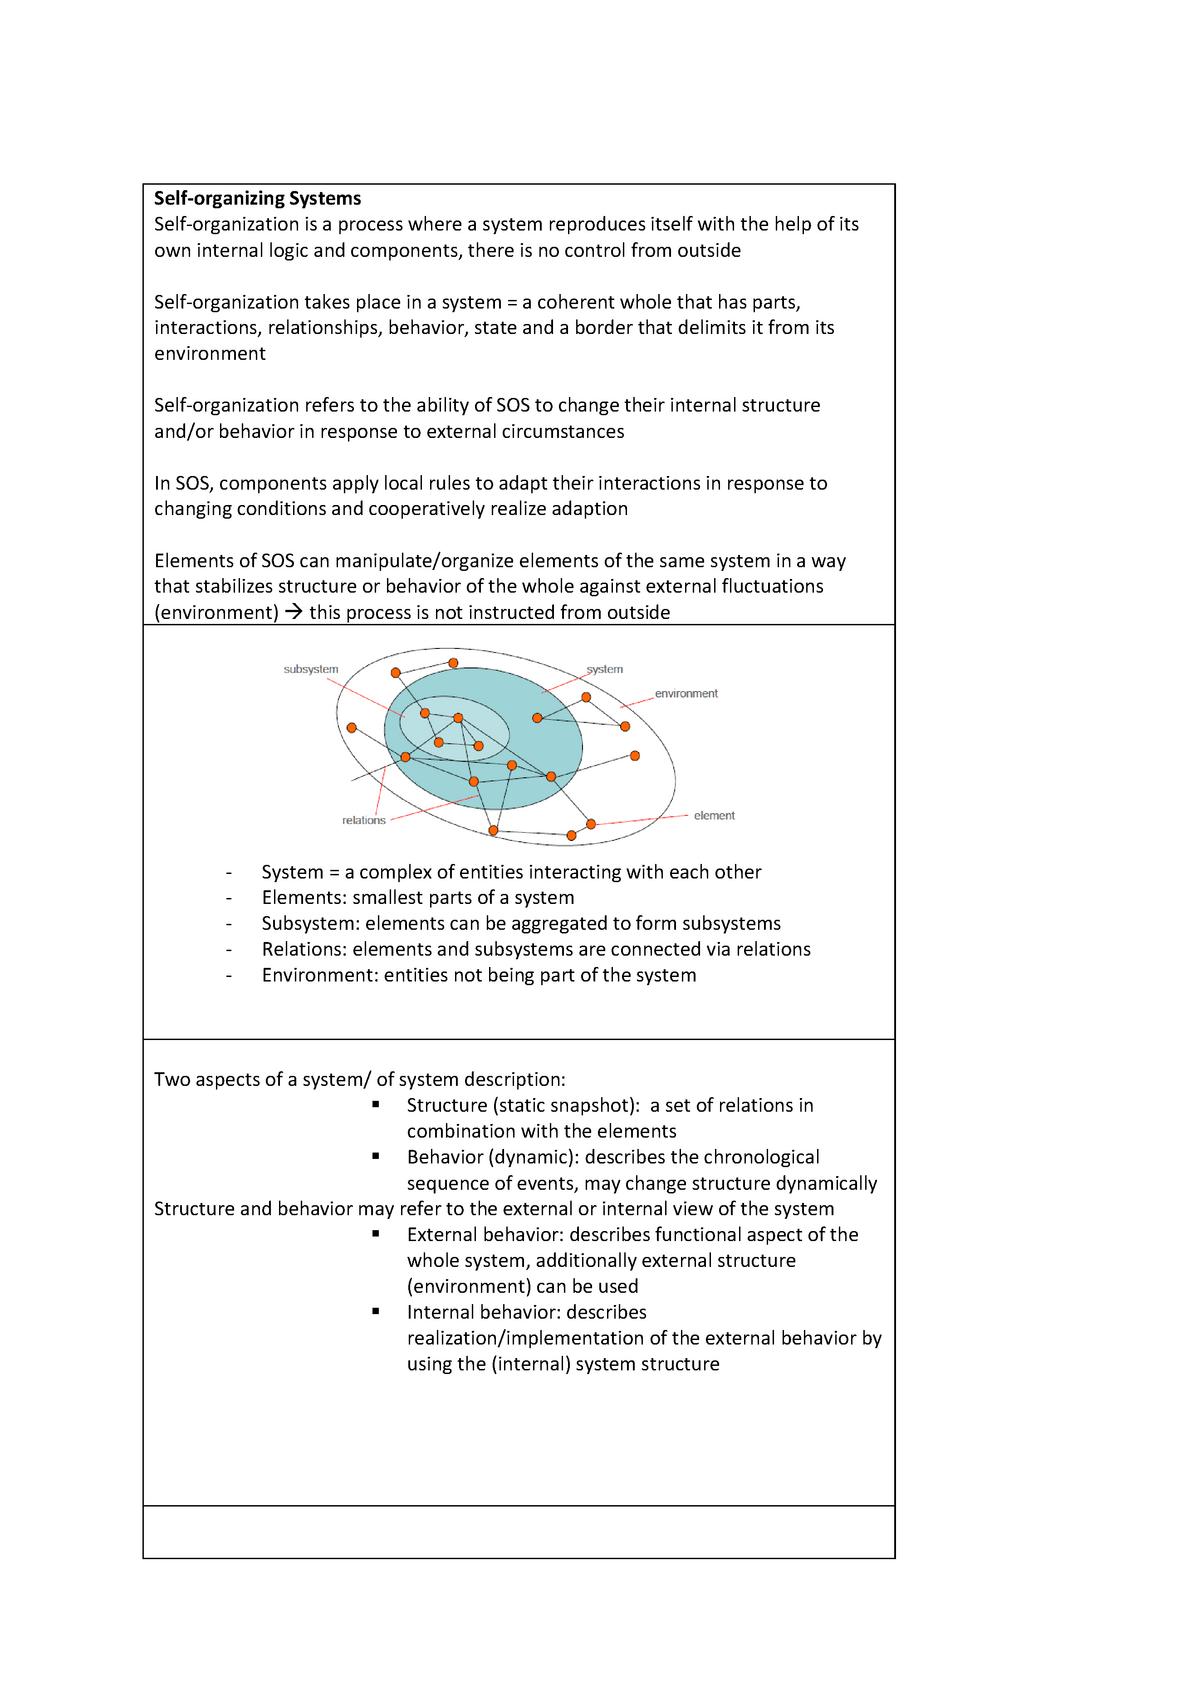 SOS Summary - Zusammenfassung Self-Organizing Systems - StuDocu